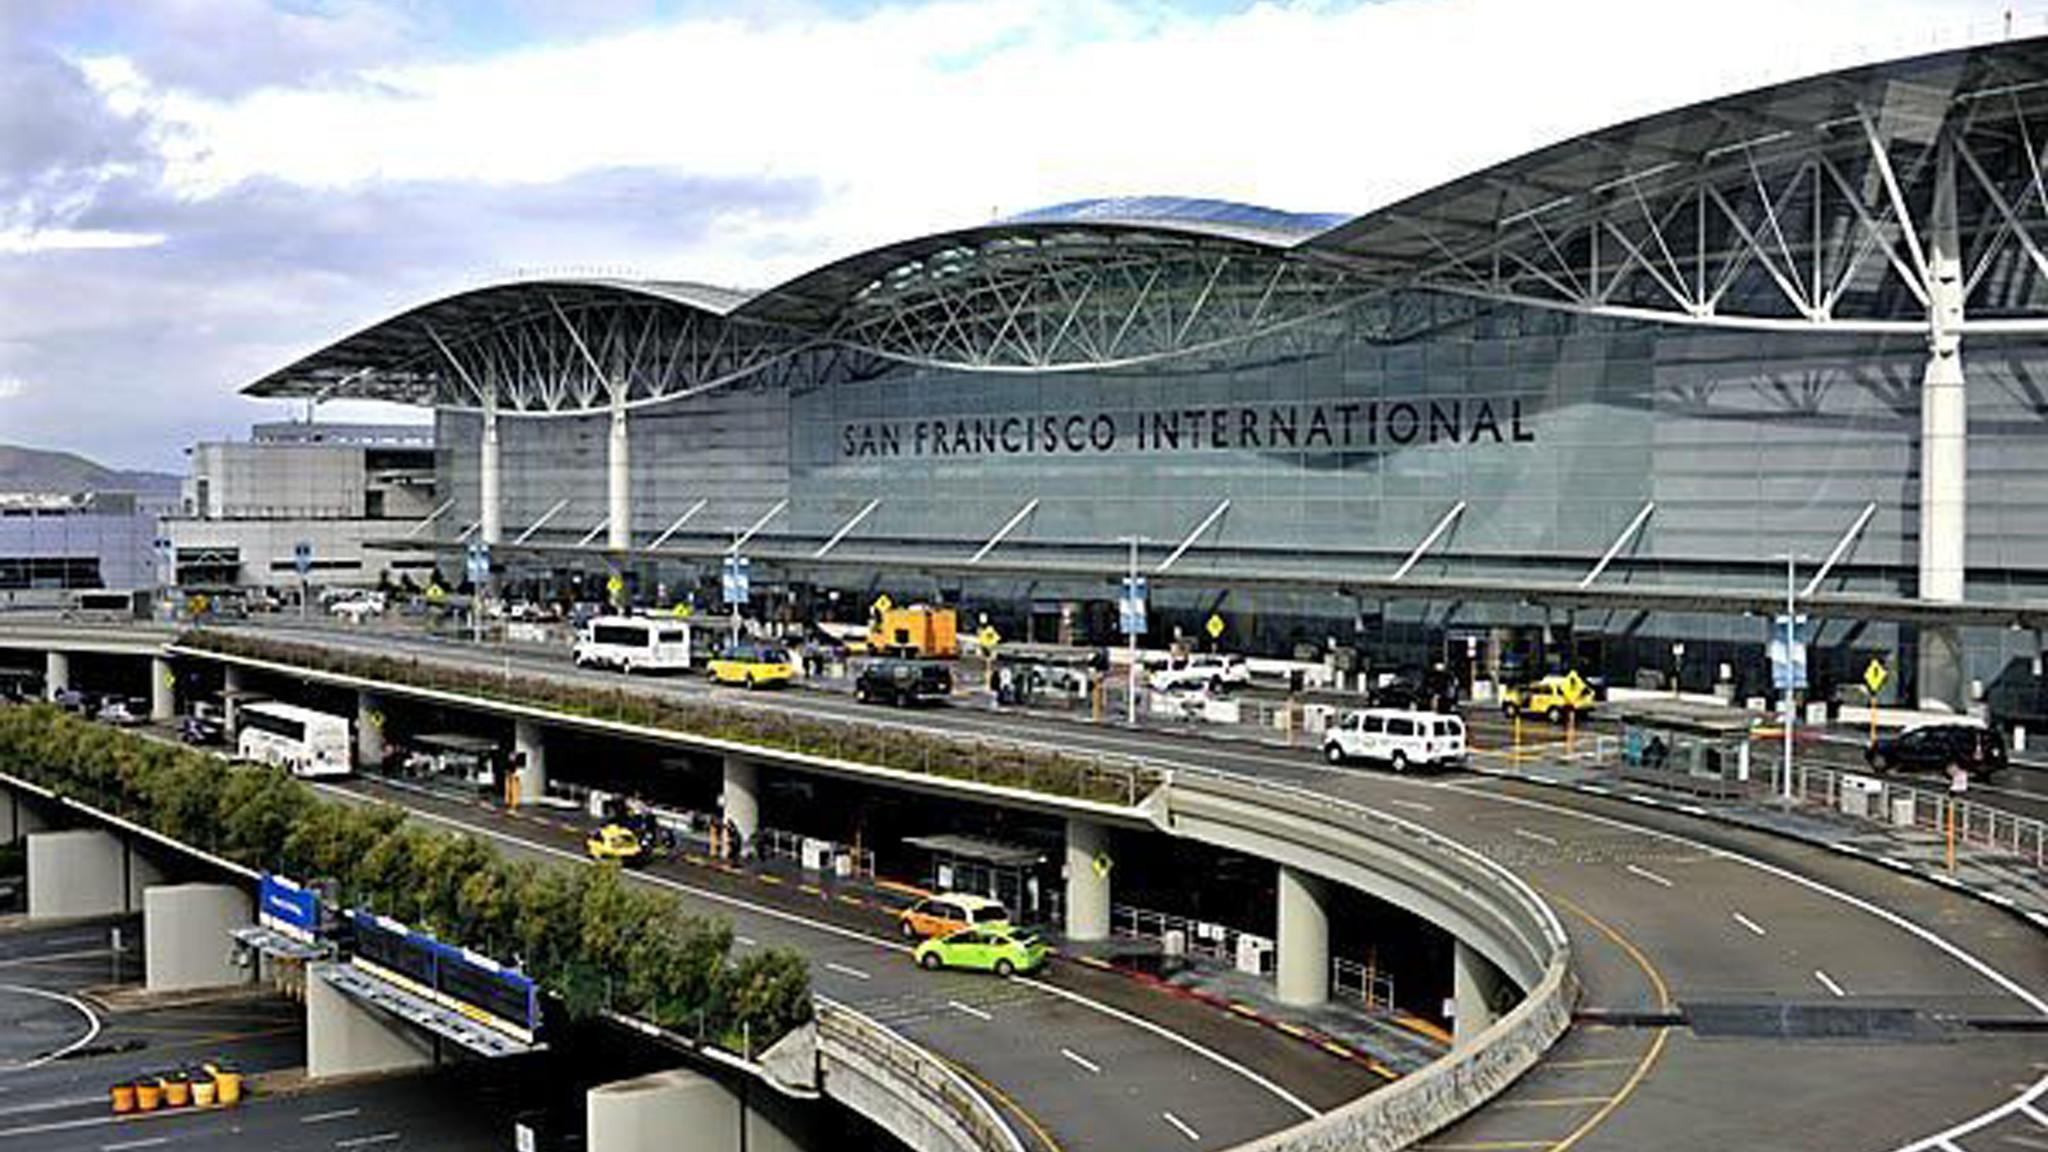 Cheap Airport Car Rental DealsEconomy Car Hire Rent